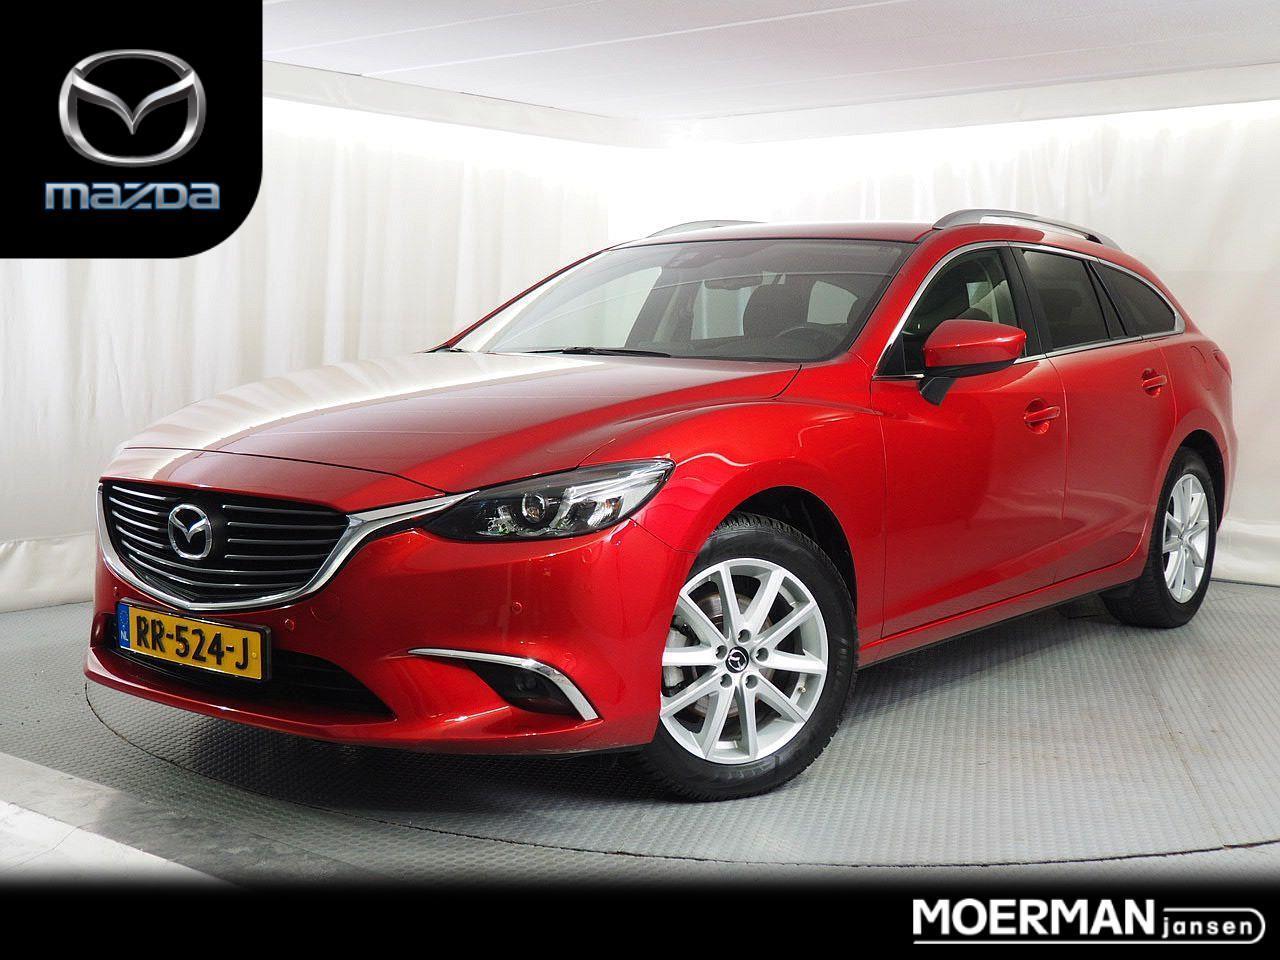 Mazda 6 Sportbreak 2.0 sportbreak / navigatie / trekhaak / dealer onderhouden / climate&cruise control